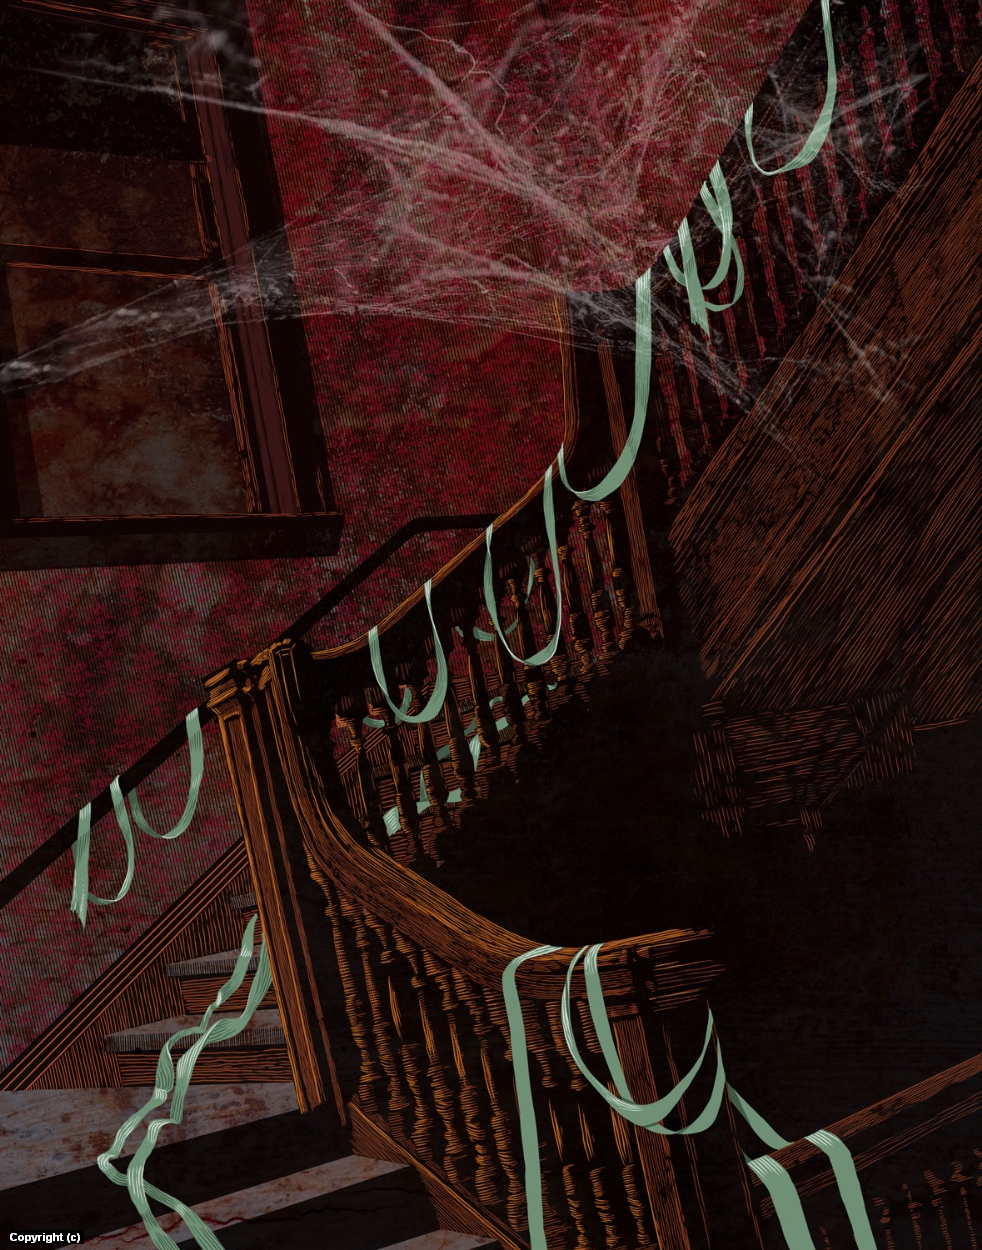 No Green Tissues Artwork by Douglas Bell